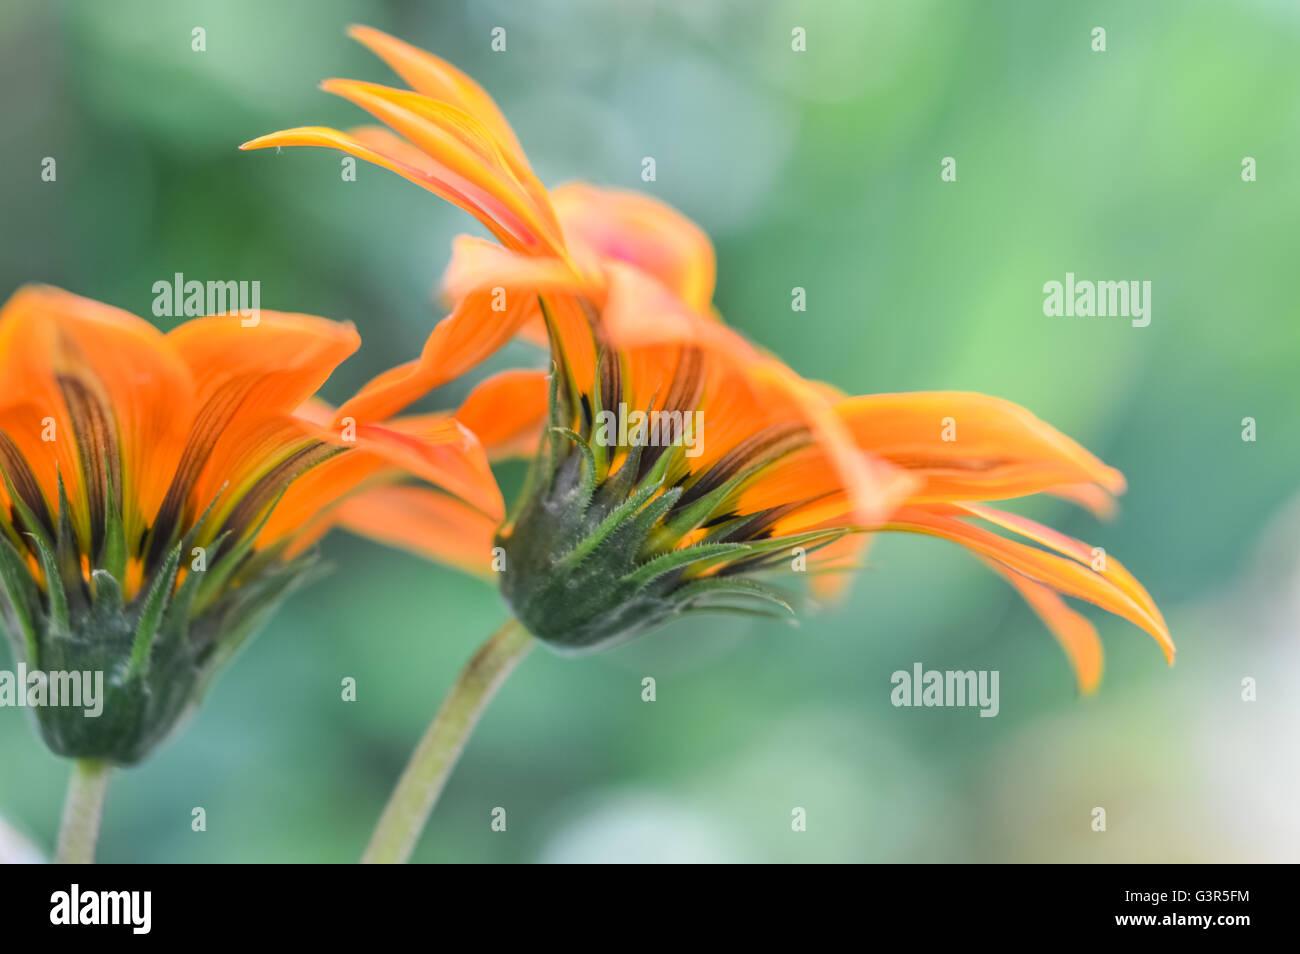 Bright orange gazania flowers stock photos bright orange gazania beautiful orange gazania flowers profile stock image izmirmasajfo